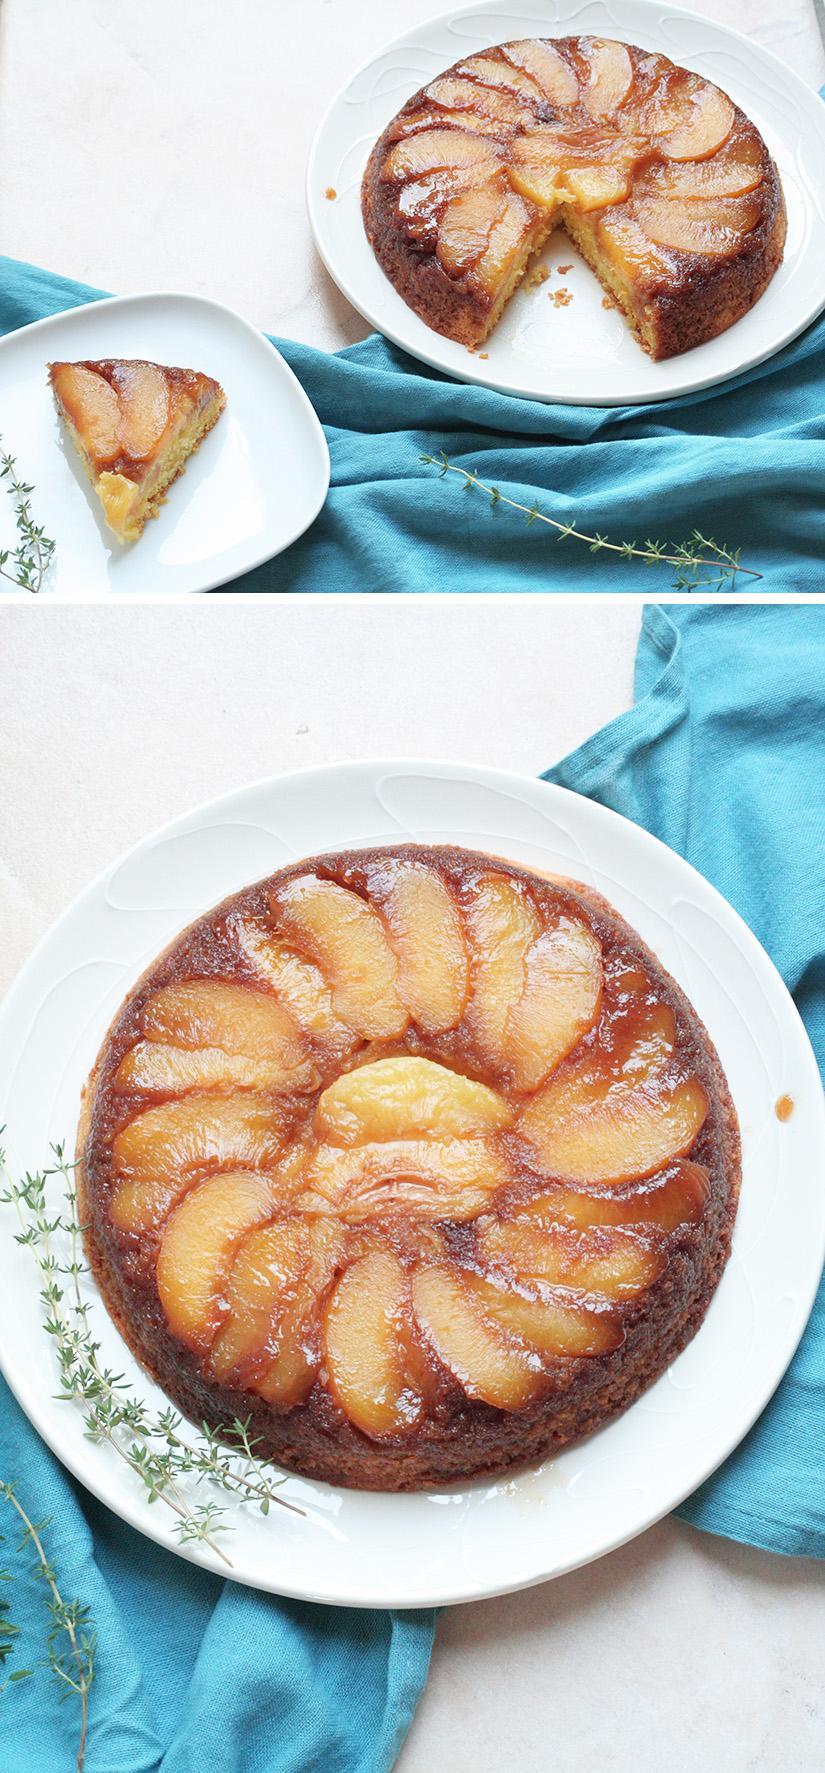 Peach Lemon Thyme Upside Down Cake